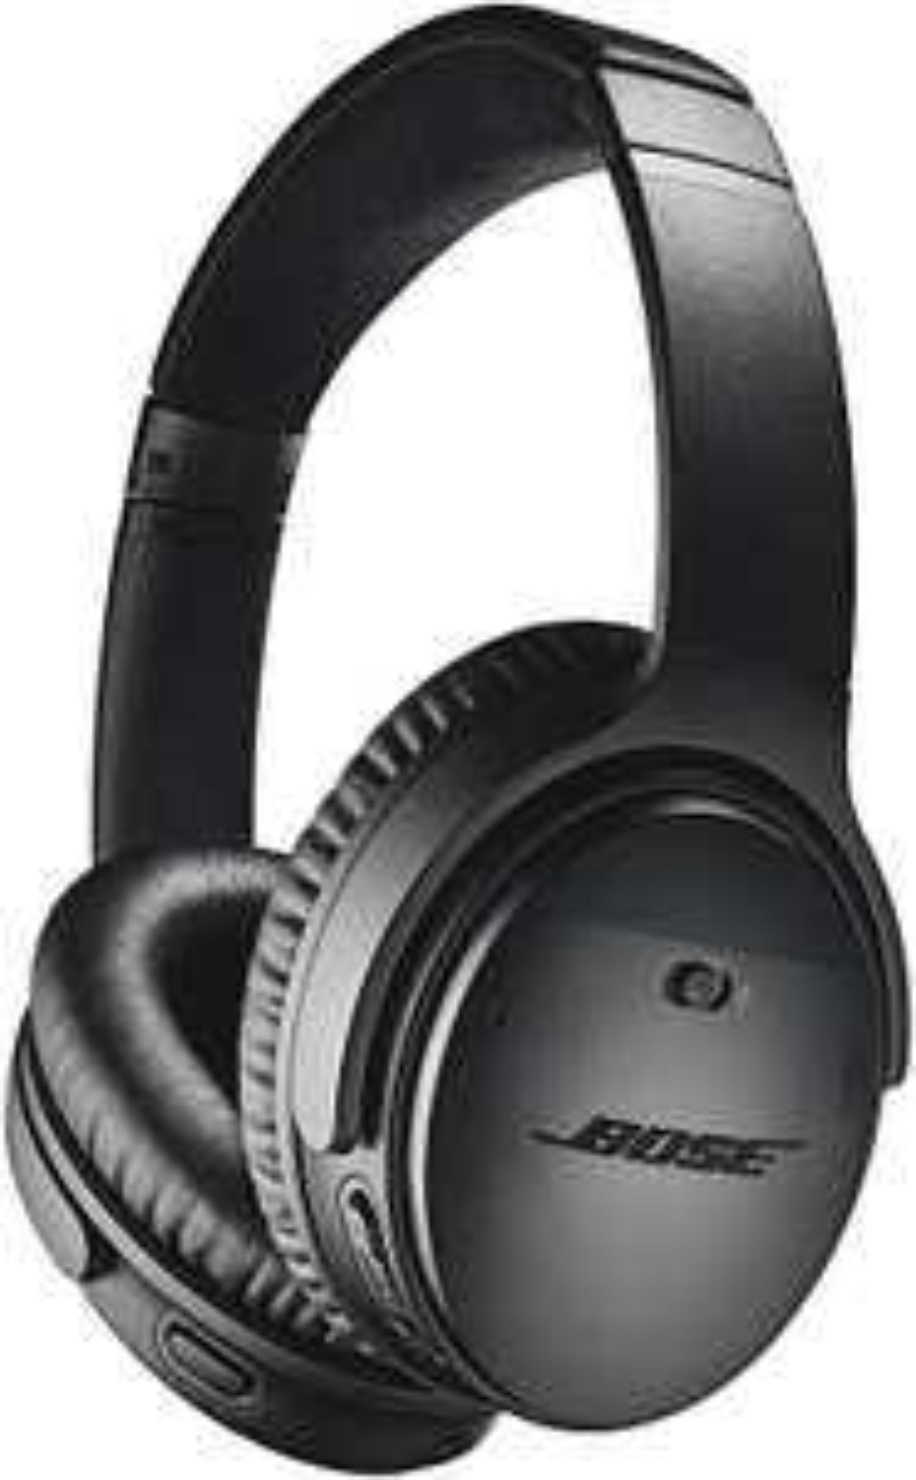 Bose QuietComfort 35 Series 1 Wireless Headphones - £143.96 instore @ Costco (Chingford)